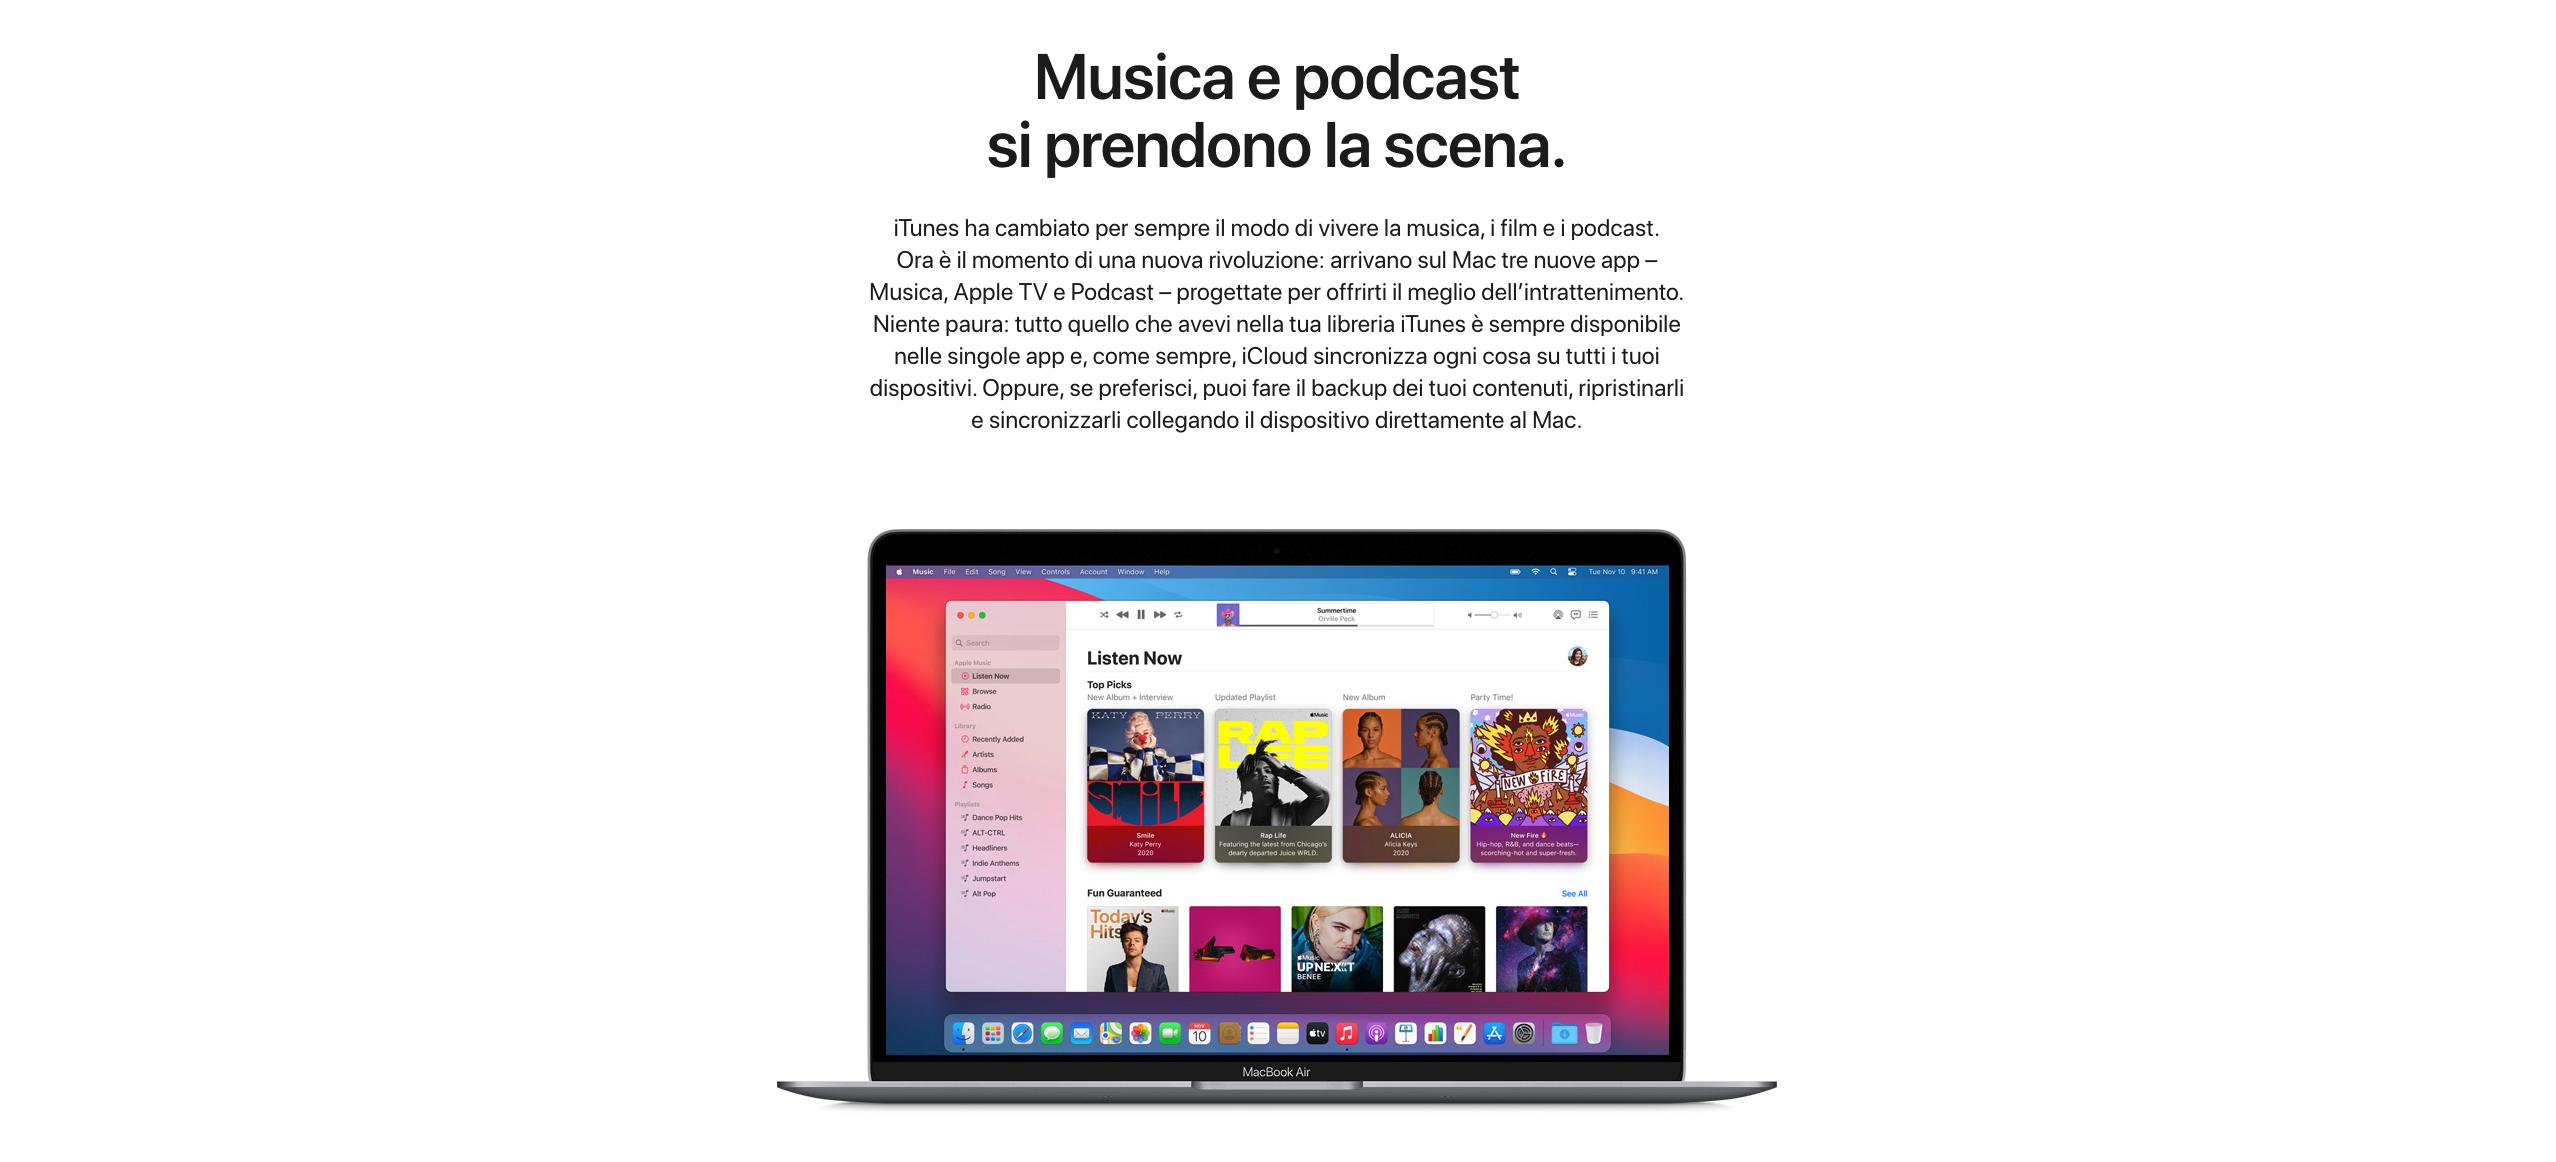 Acquista online una iTunes card